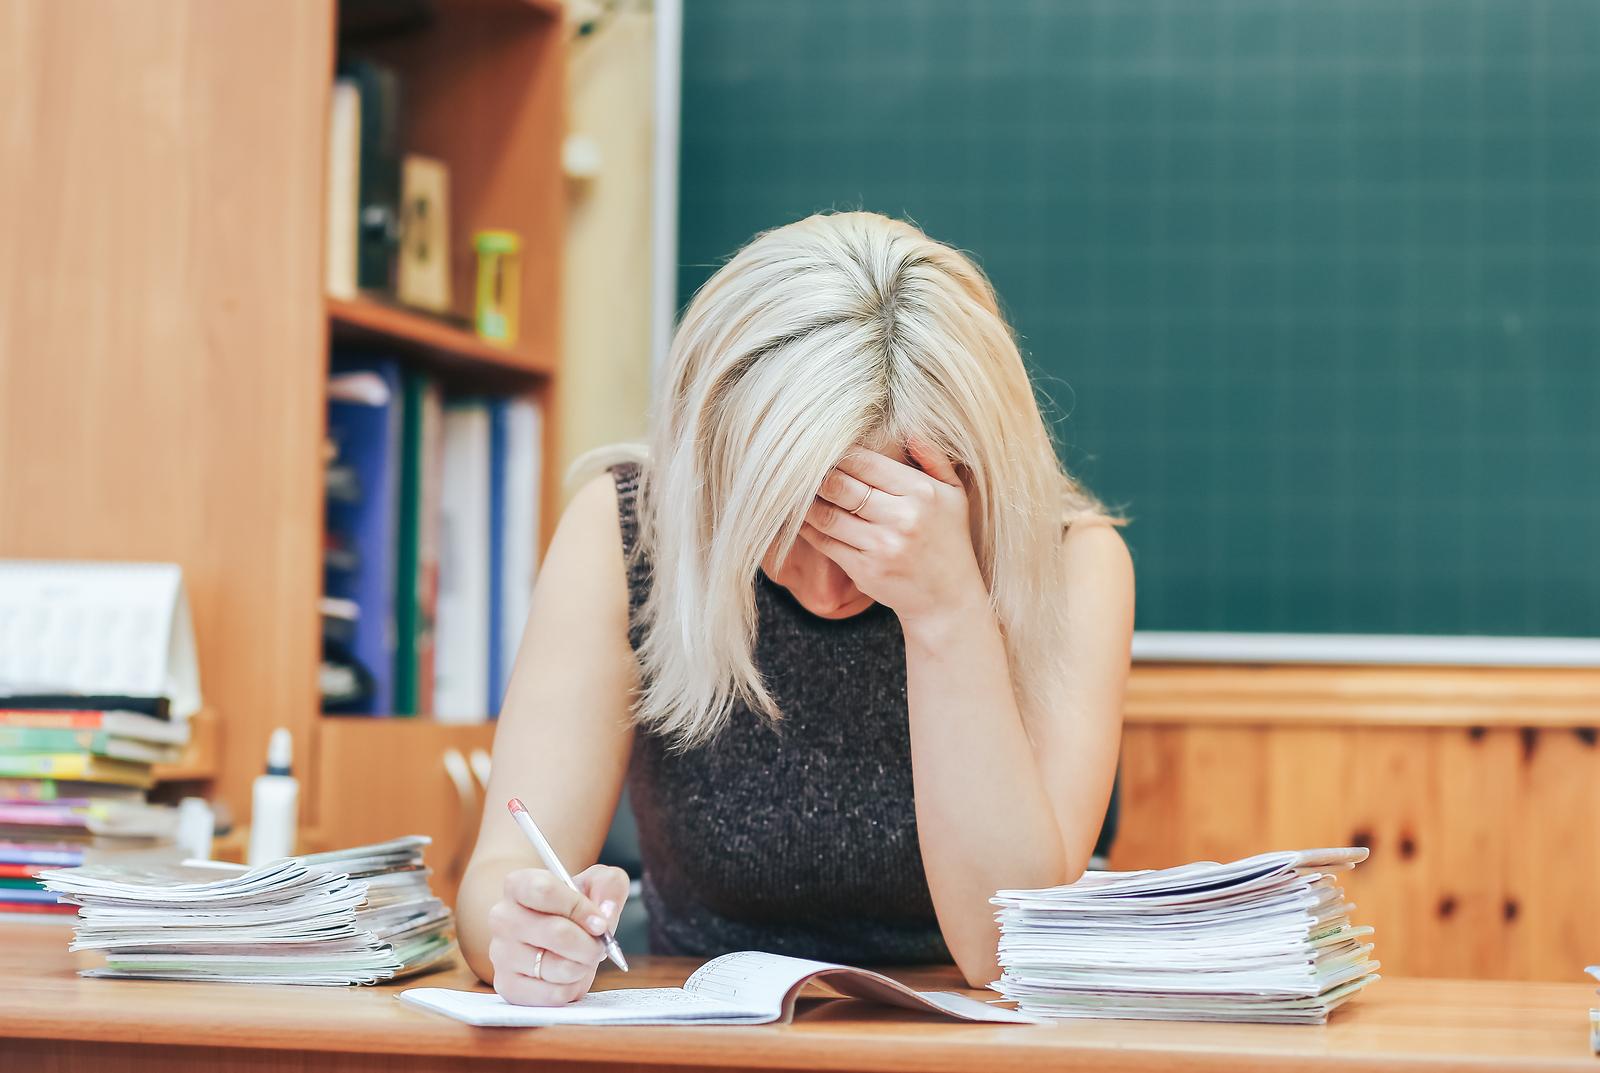 Teacher frustration evaluating tests at school